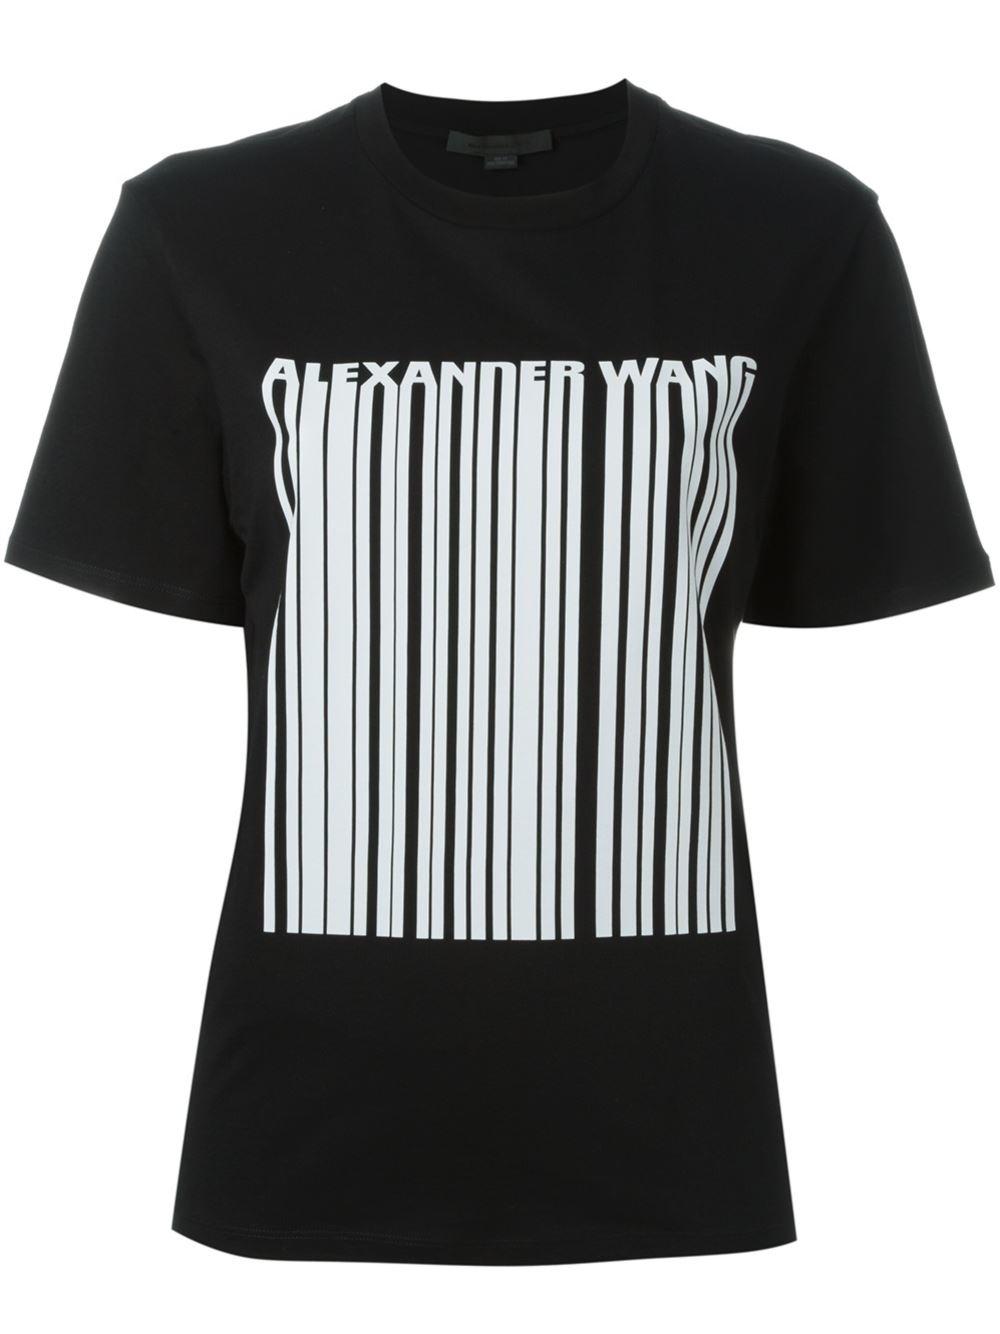 Alexander Wang Qr Code Print T-shirt in Black for Men - Lyst